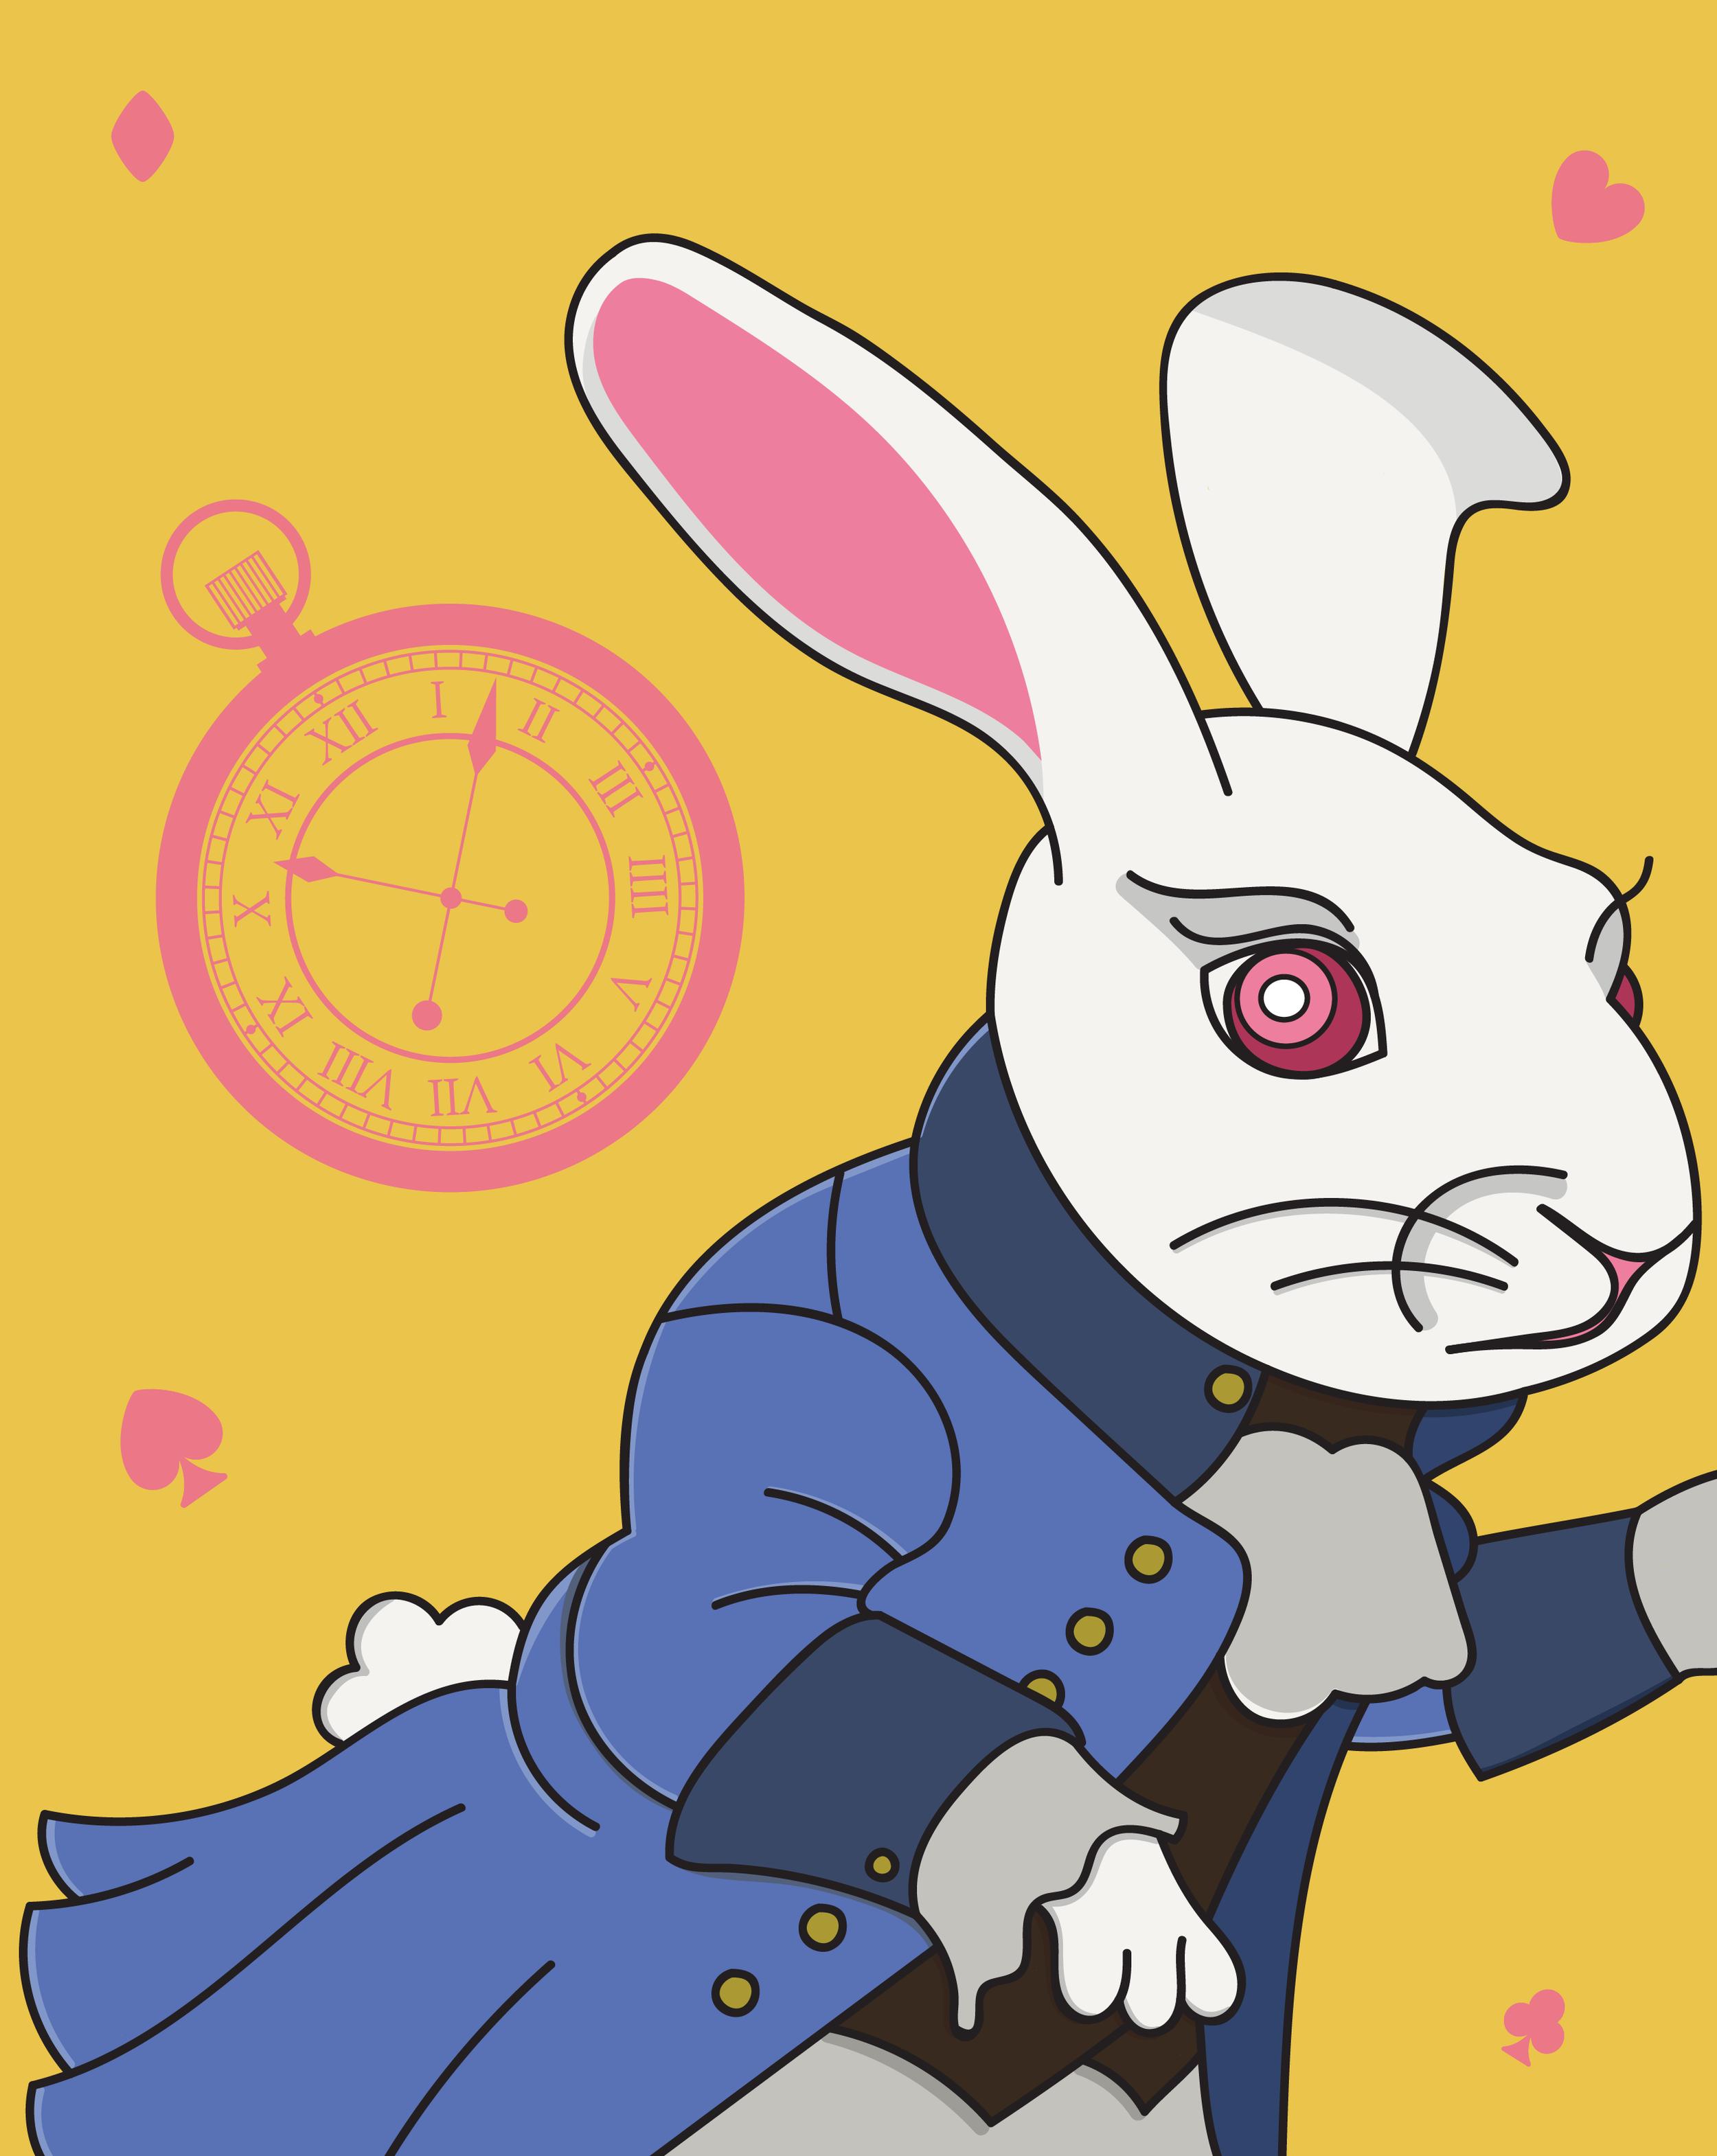 rabbit3-01.png